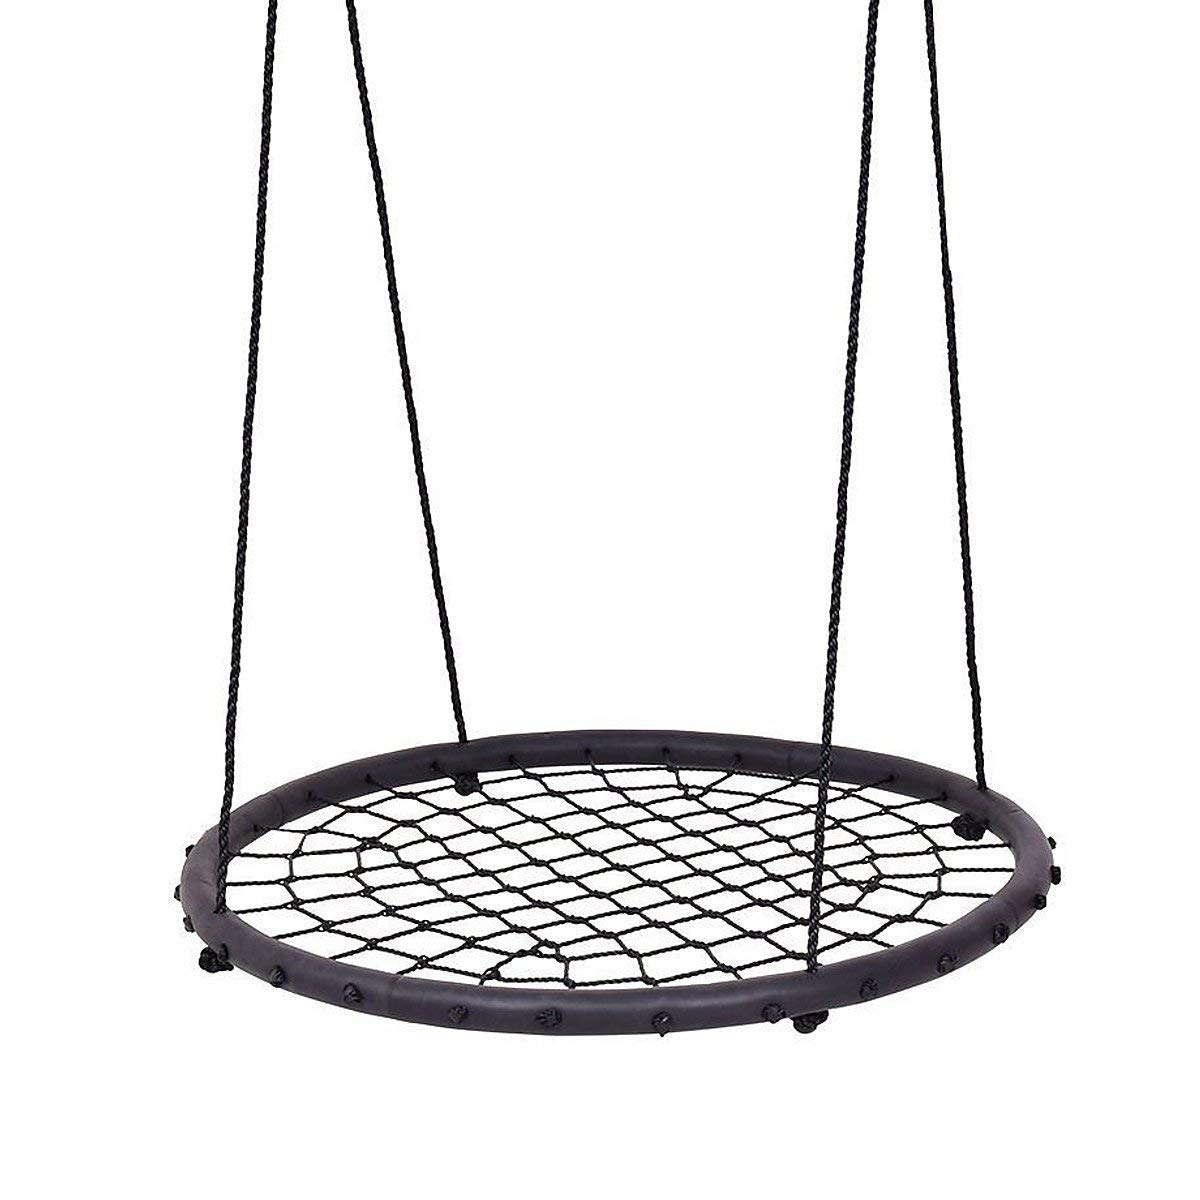 Costzon 40 Tree Swing Round Net Children's Detachable Web Swing, 440lbs Capacity, Black